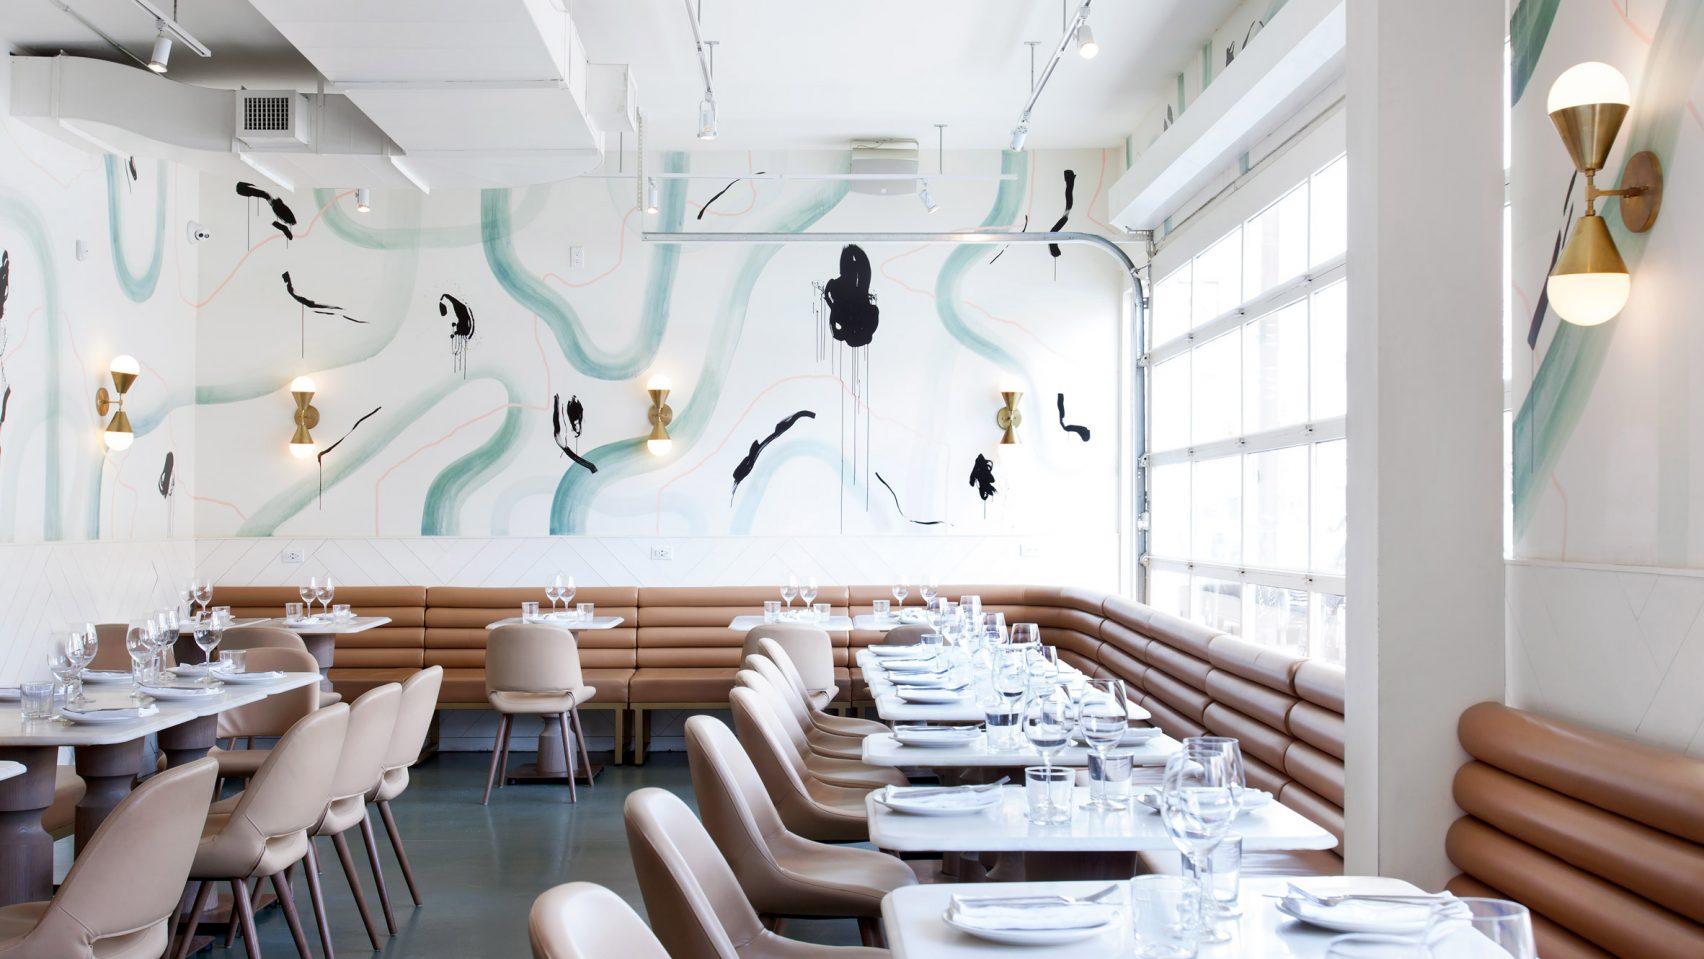 Ресторан La Palma, вдохновлённый Пляжем Венеция